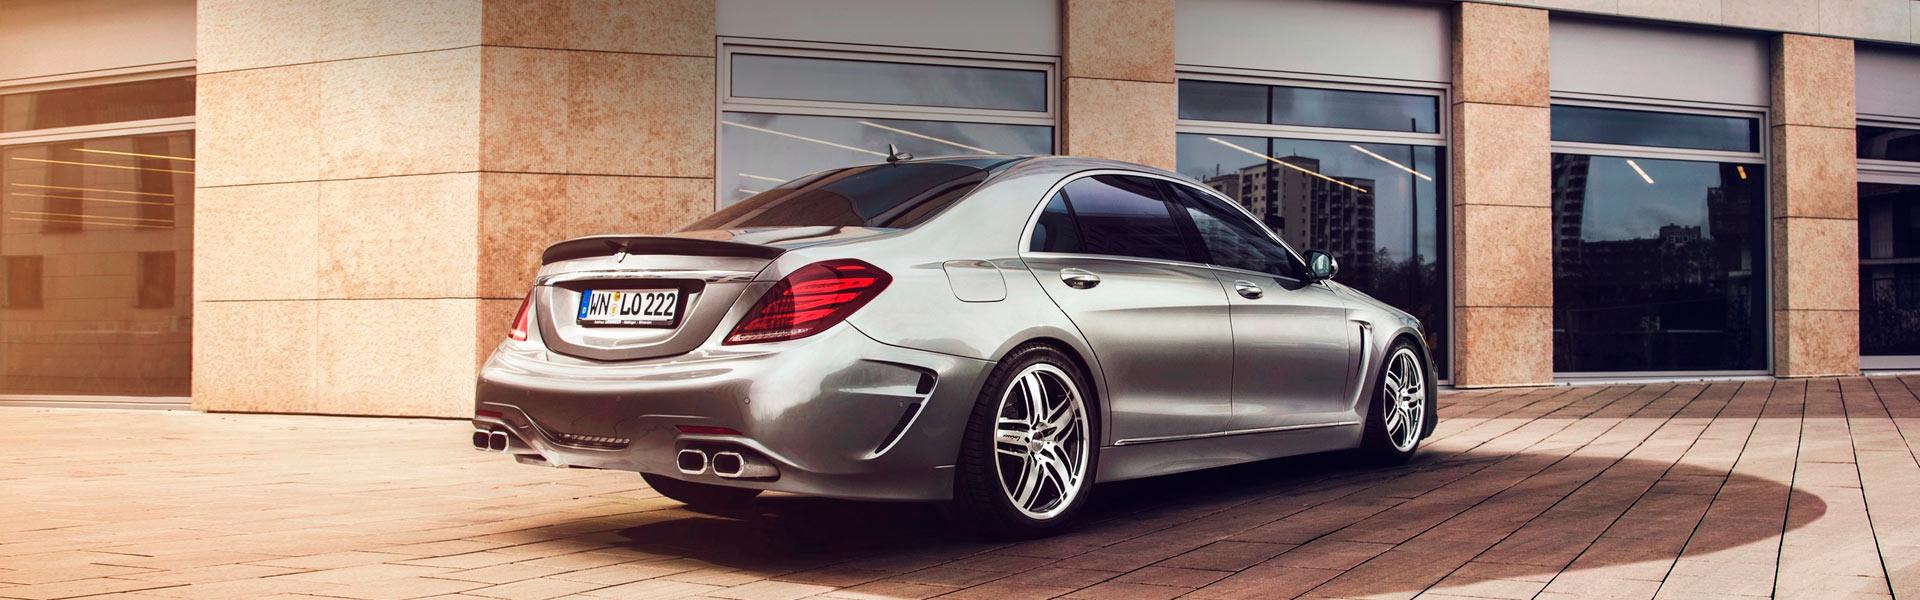 Запчасти на Mercedes S-klasse